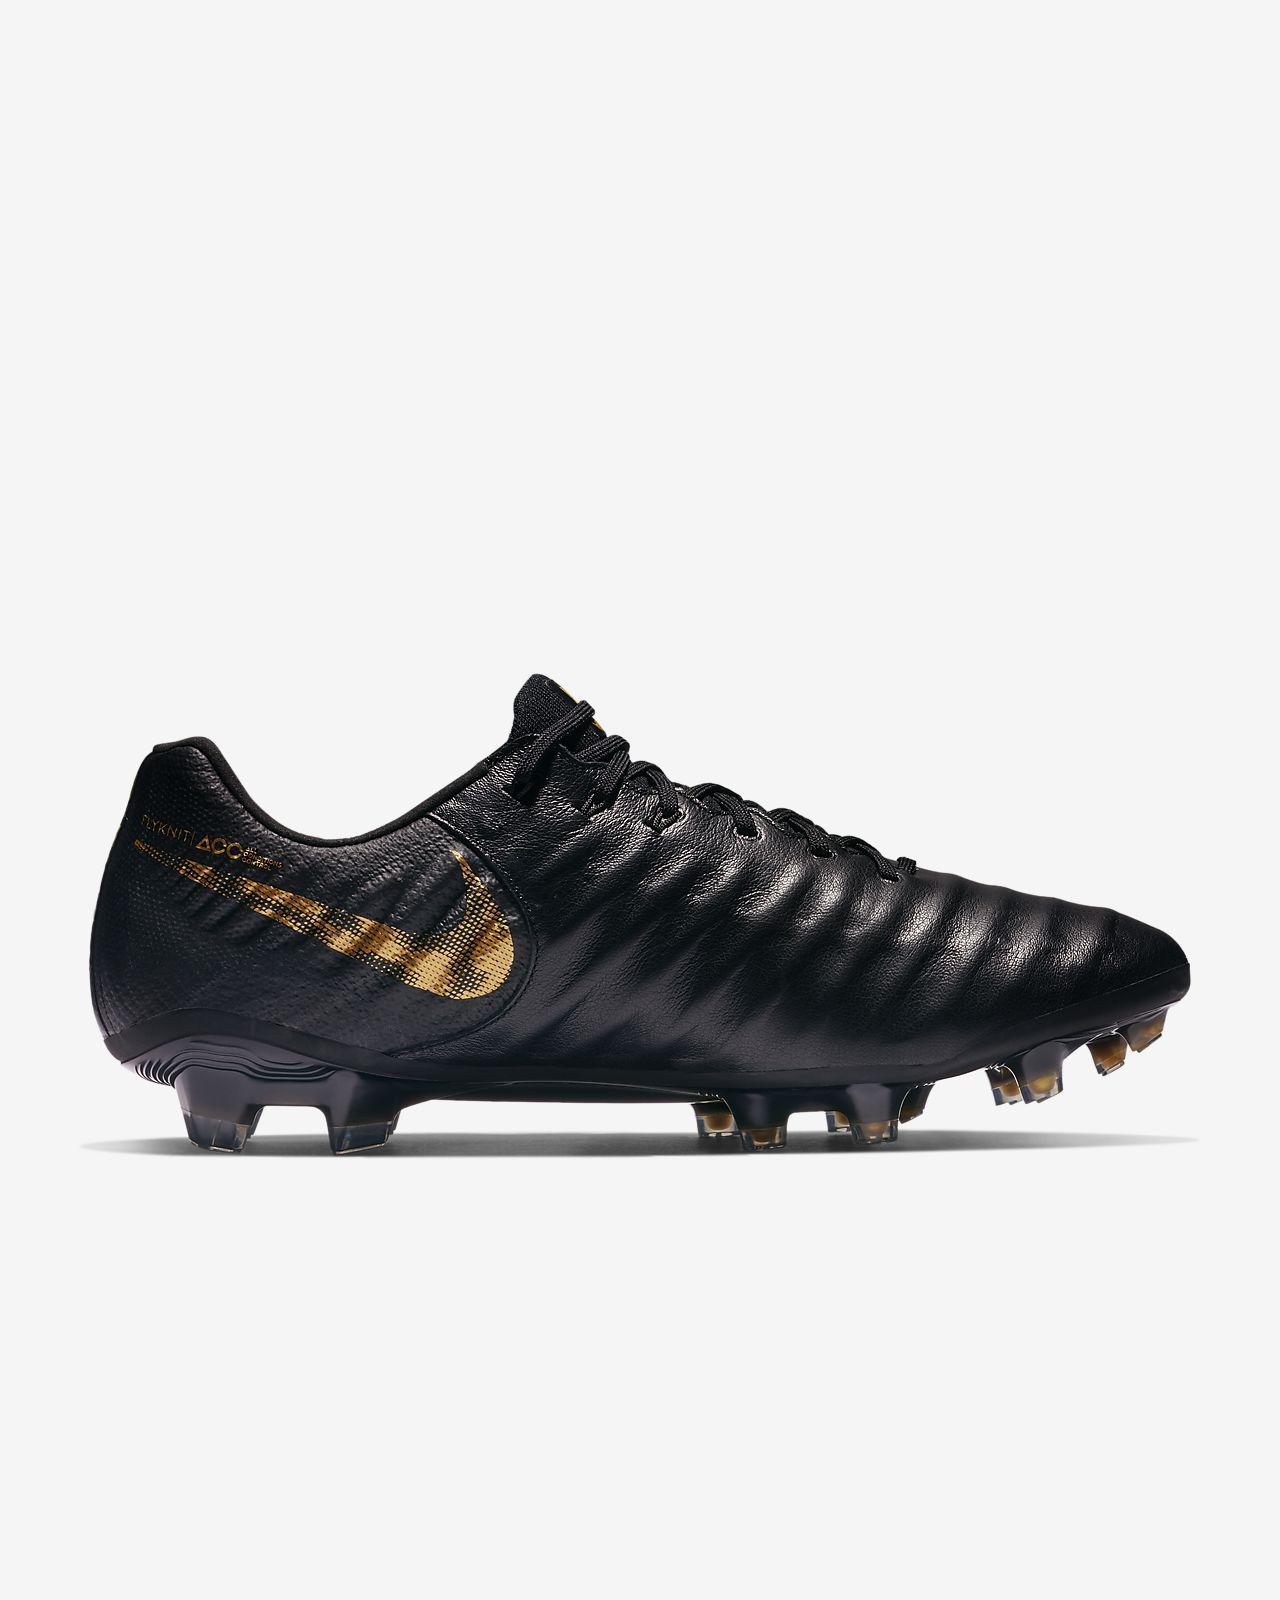 c77e94c4b55 Nike Tiempo Legend 7 Elite FG Firm-Ground Football Boot. Nike.com IN